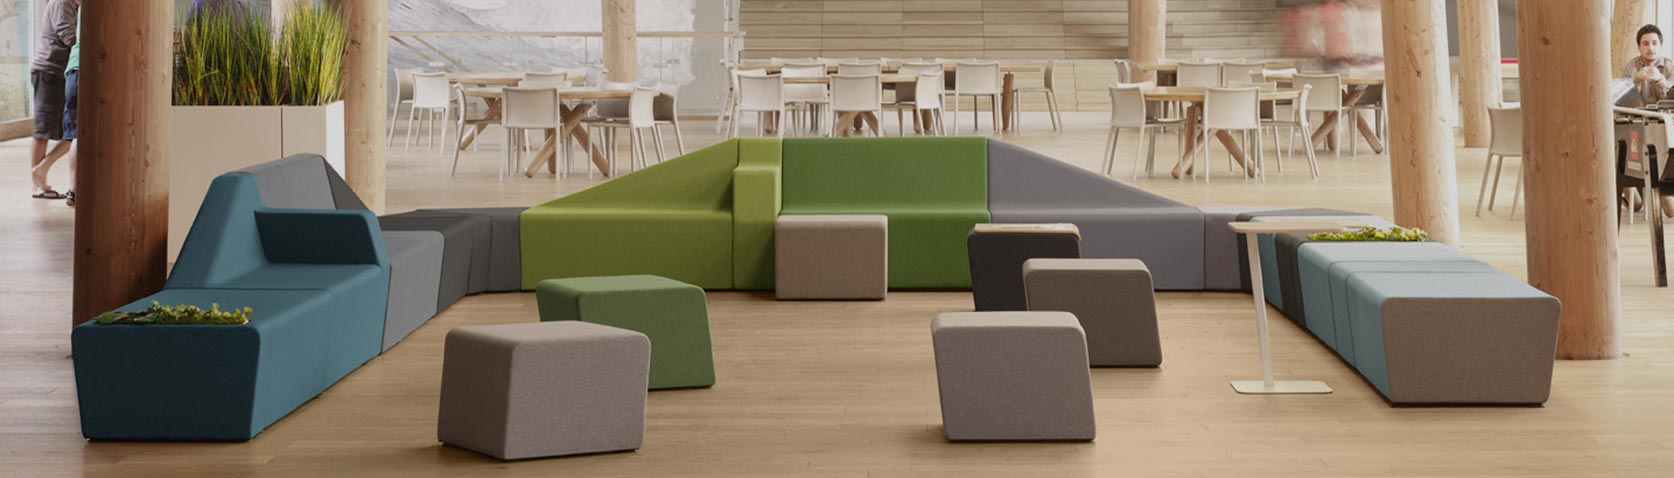 Mobiliario oficina muebles de oficina escritorio for Mobiliario oficina barato